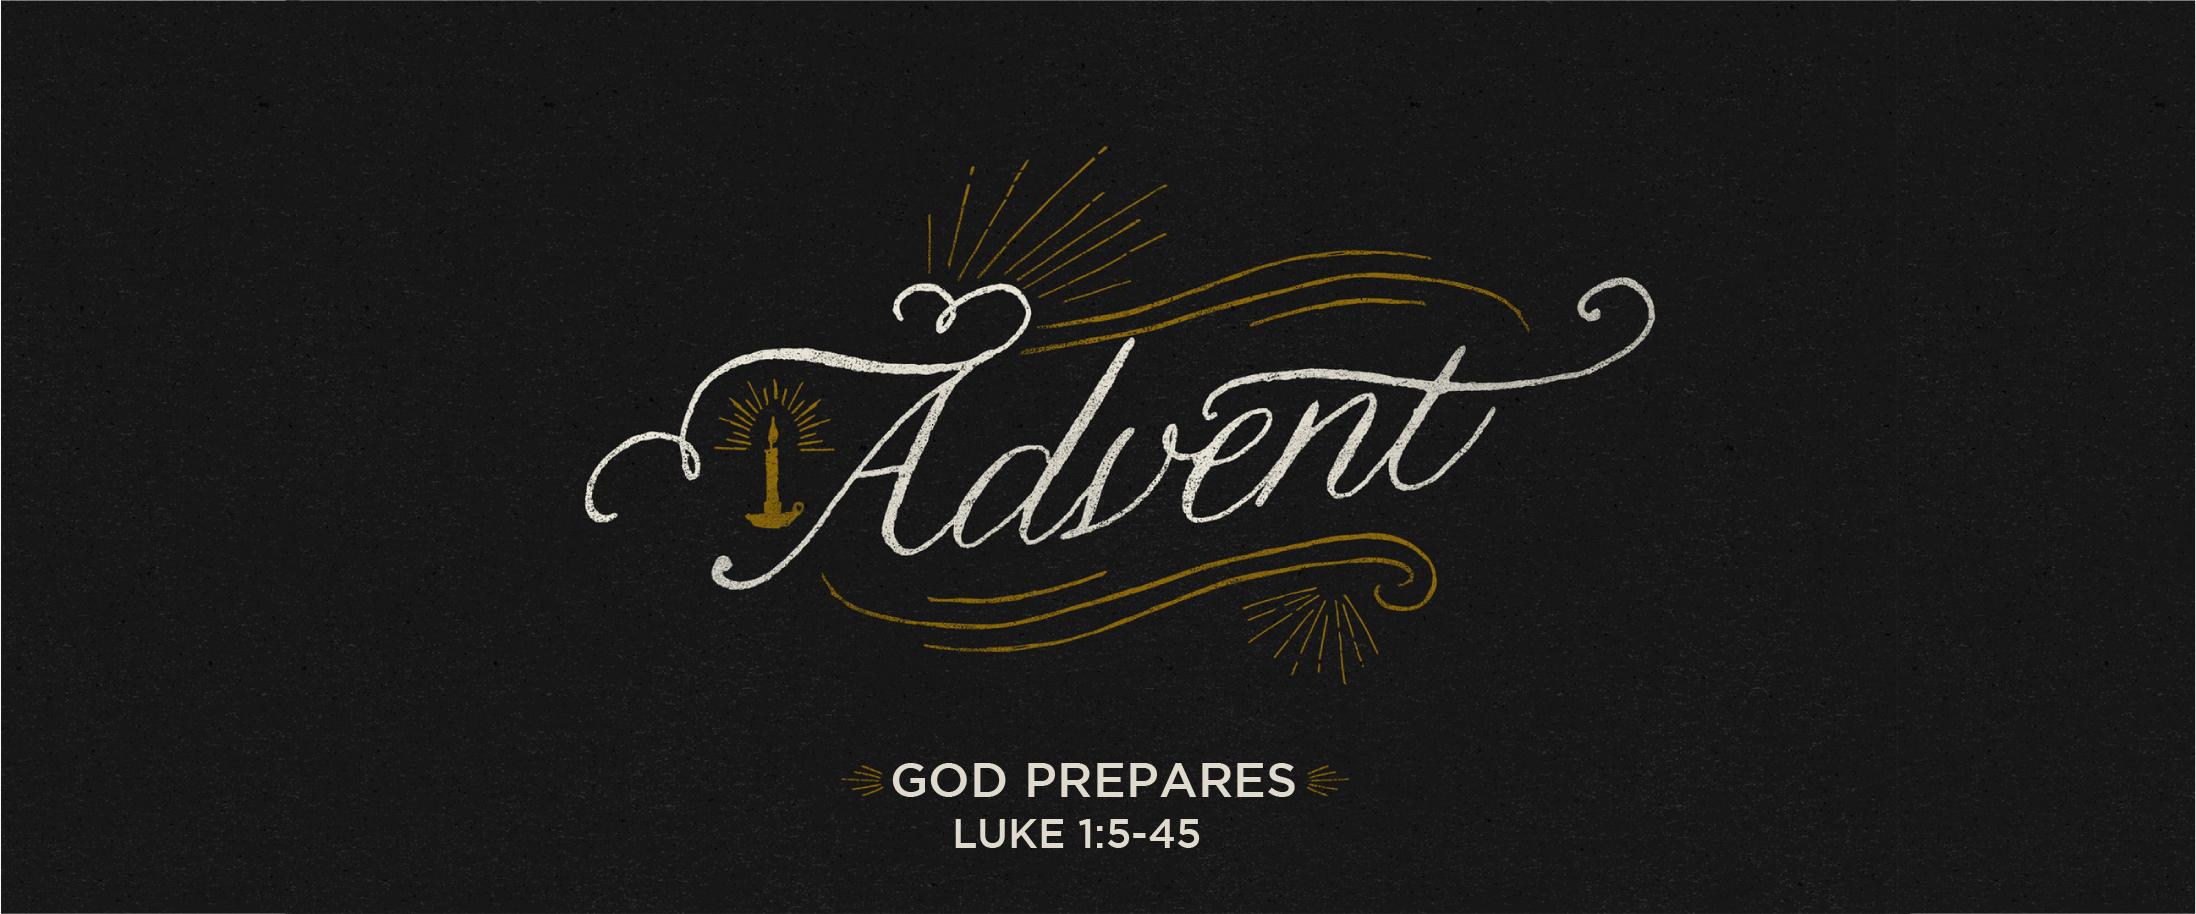 SBC, Advent 2018-01 (2).jpg